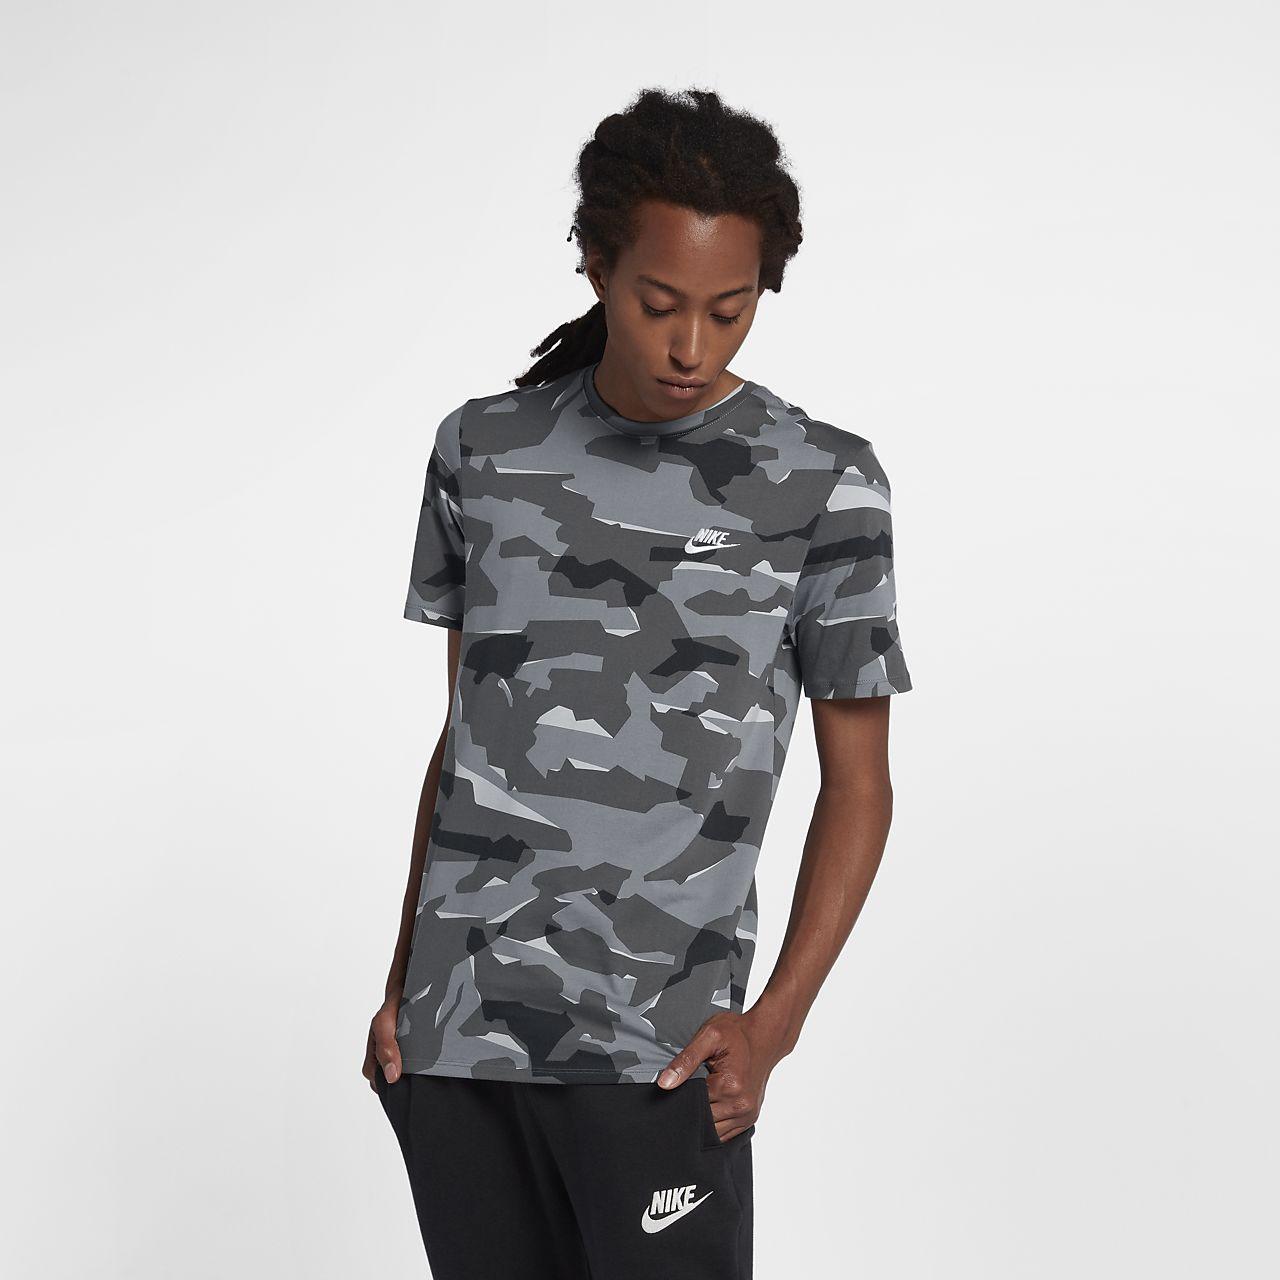 Tee Homme Sportswear Pour Camouflage Ca Shirt Nike rRqwrz8